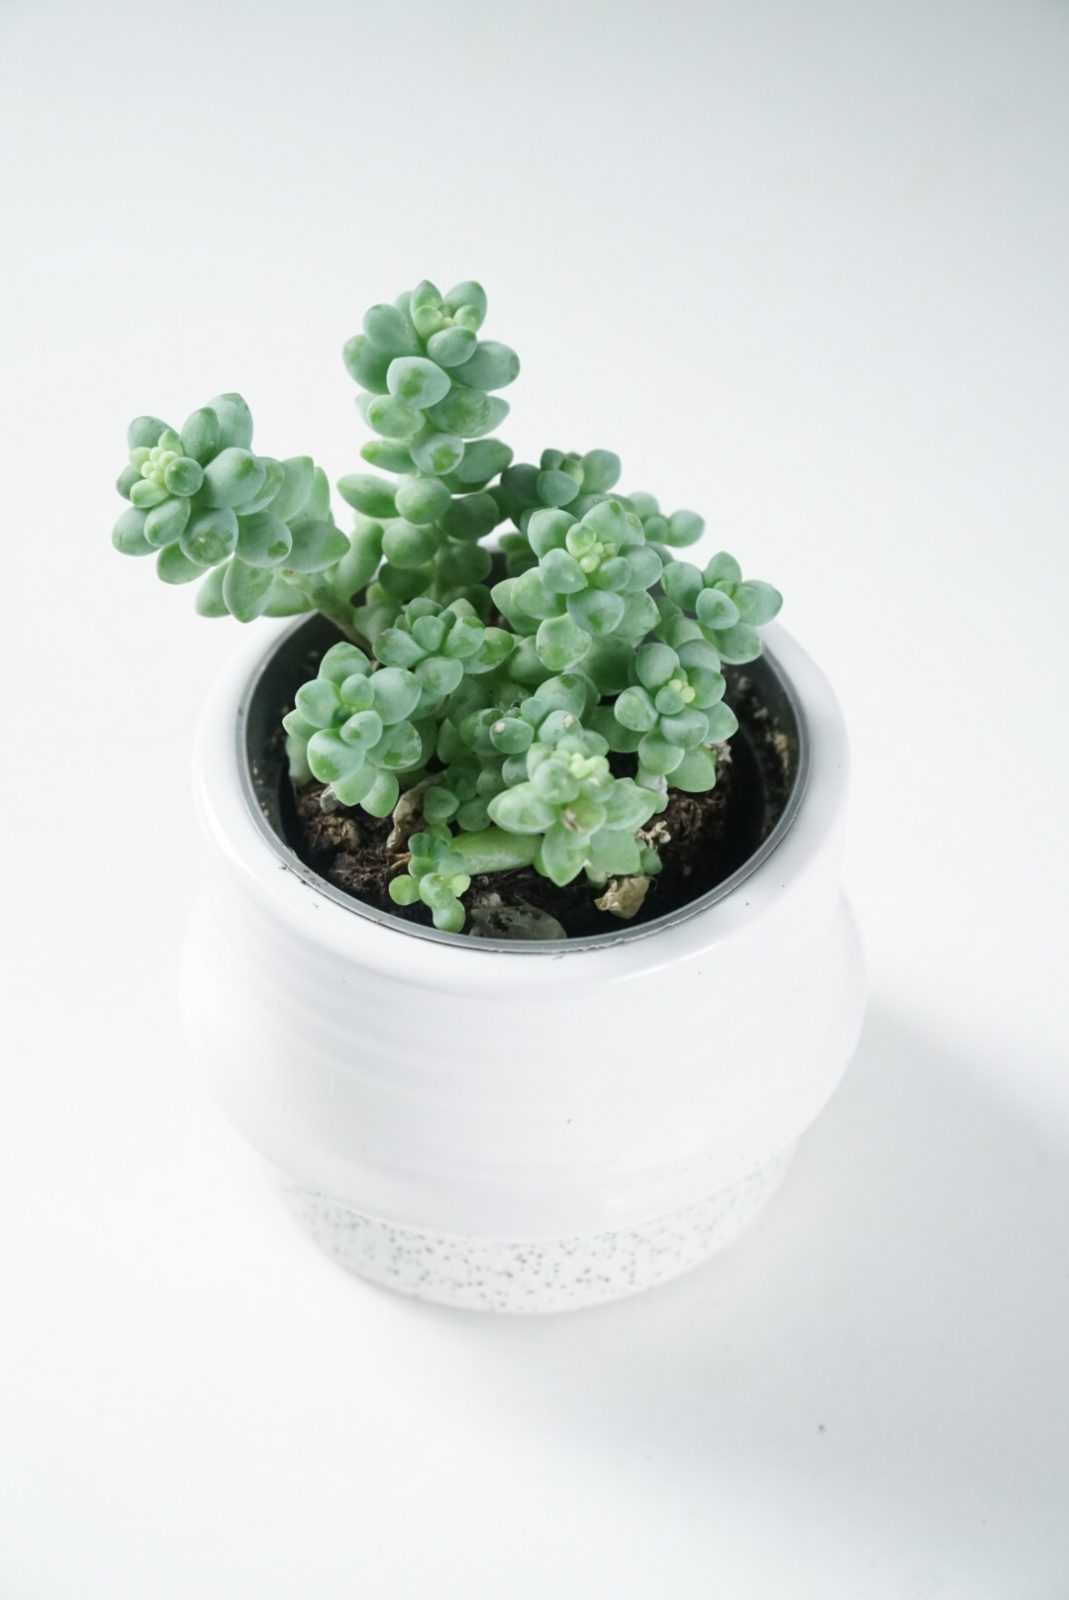 Sedum 'Burro's Tail' mini-plant buitenplant kamerplant  plant plantje stek stekje terracotta pot potje glas glaasje